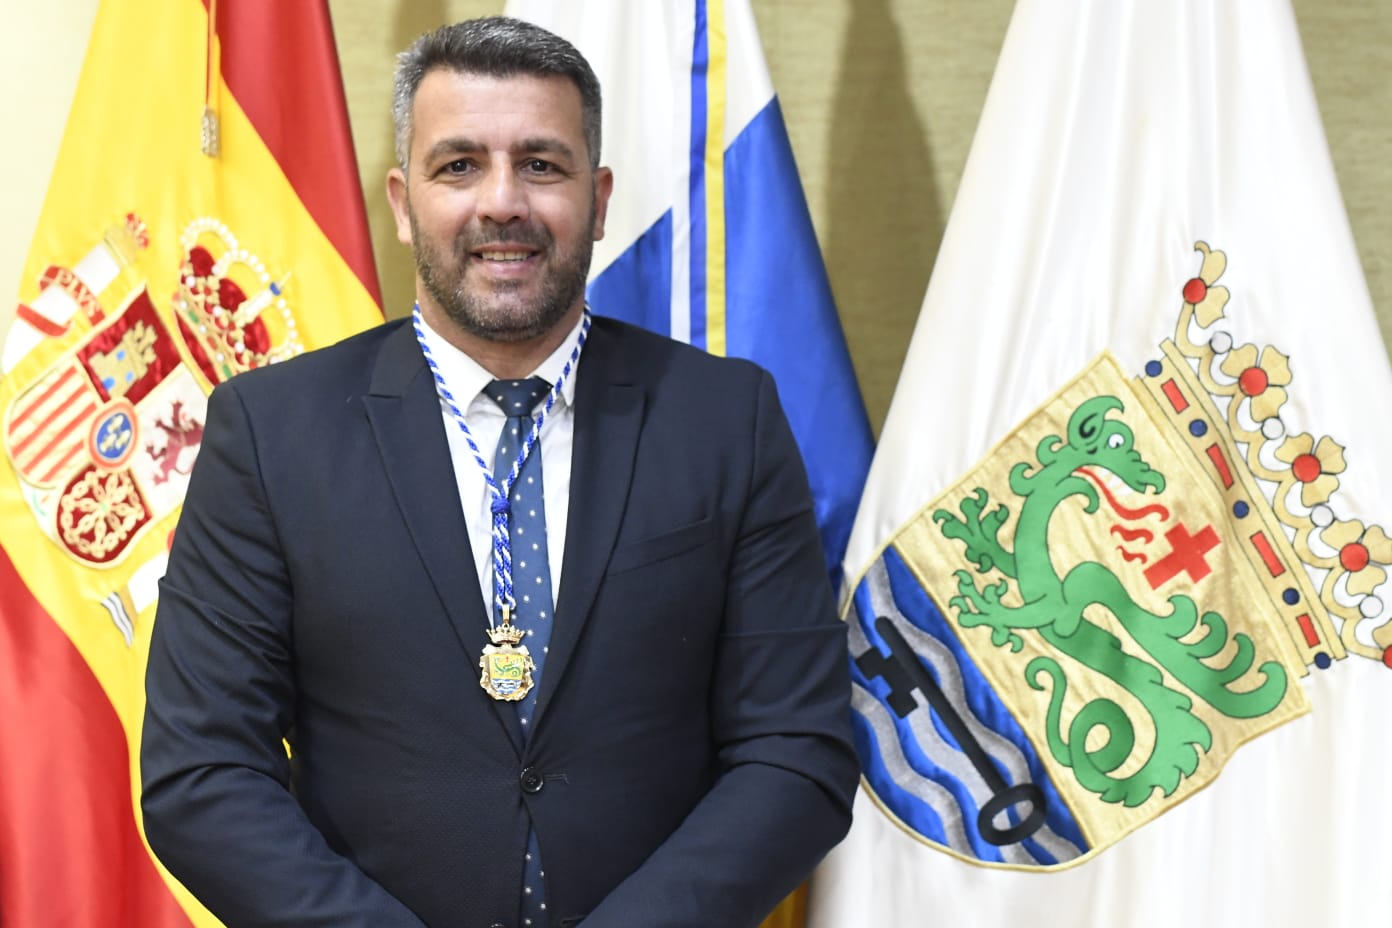 D. LUIS JAVIER GONZÁLEZ HERNÁNDEZ